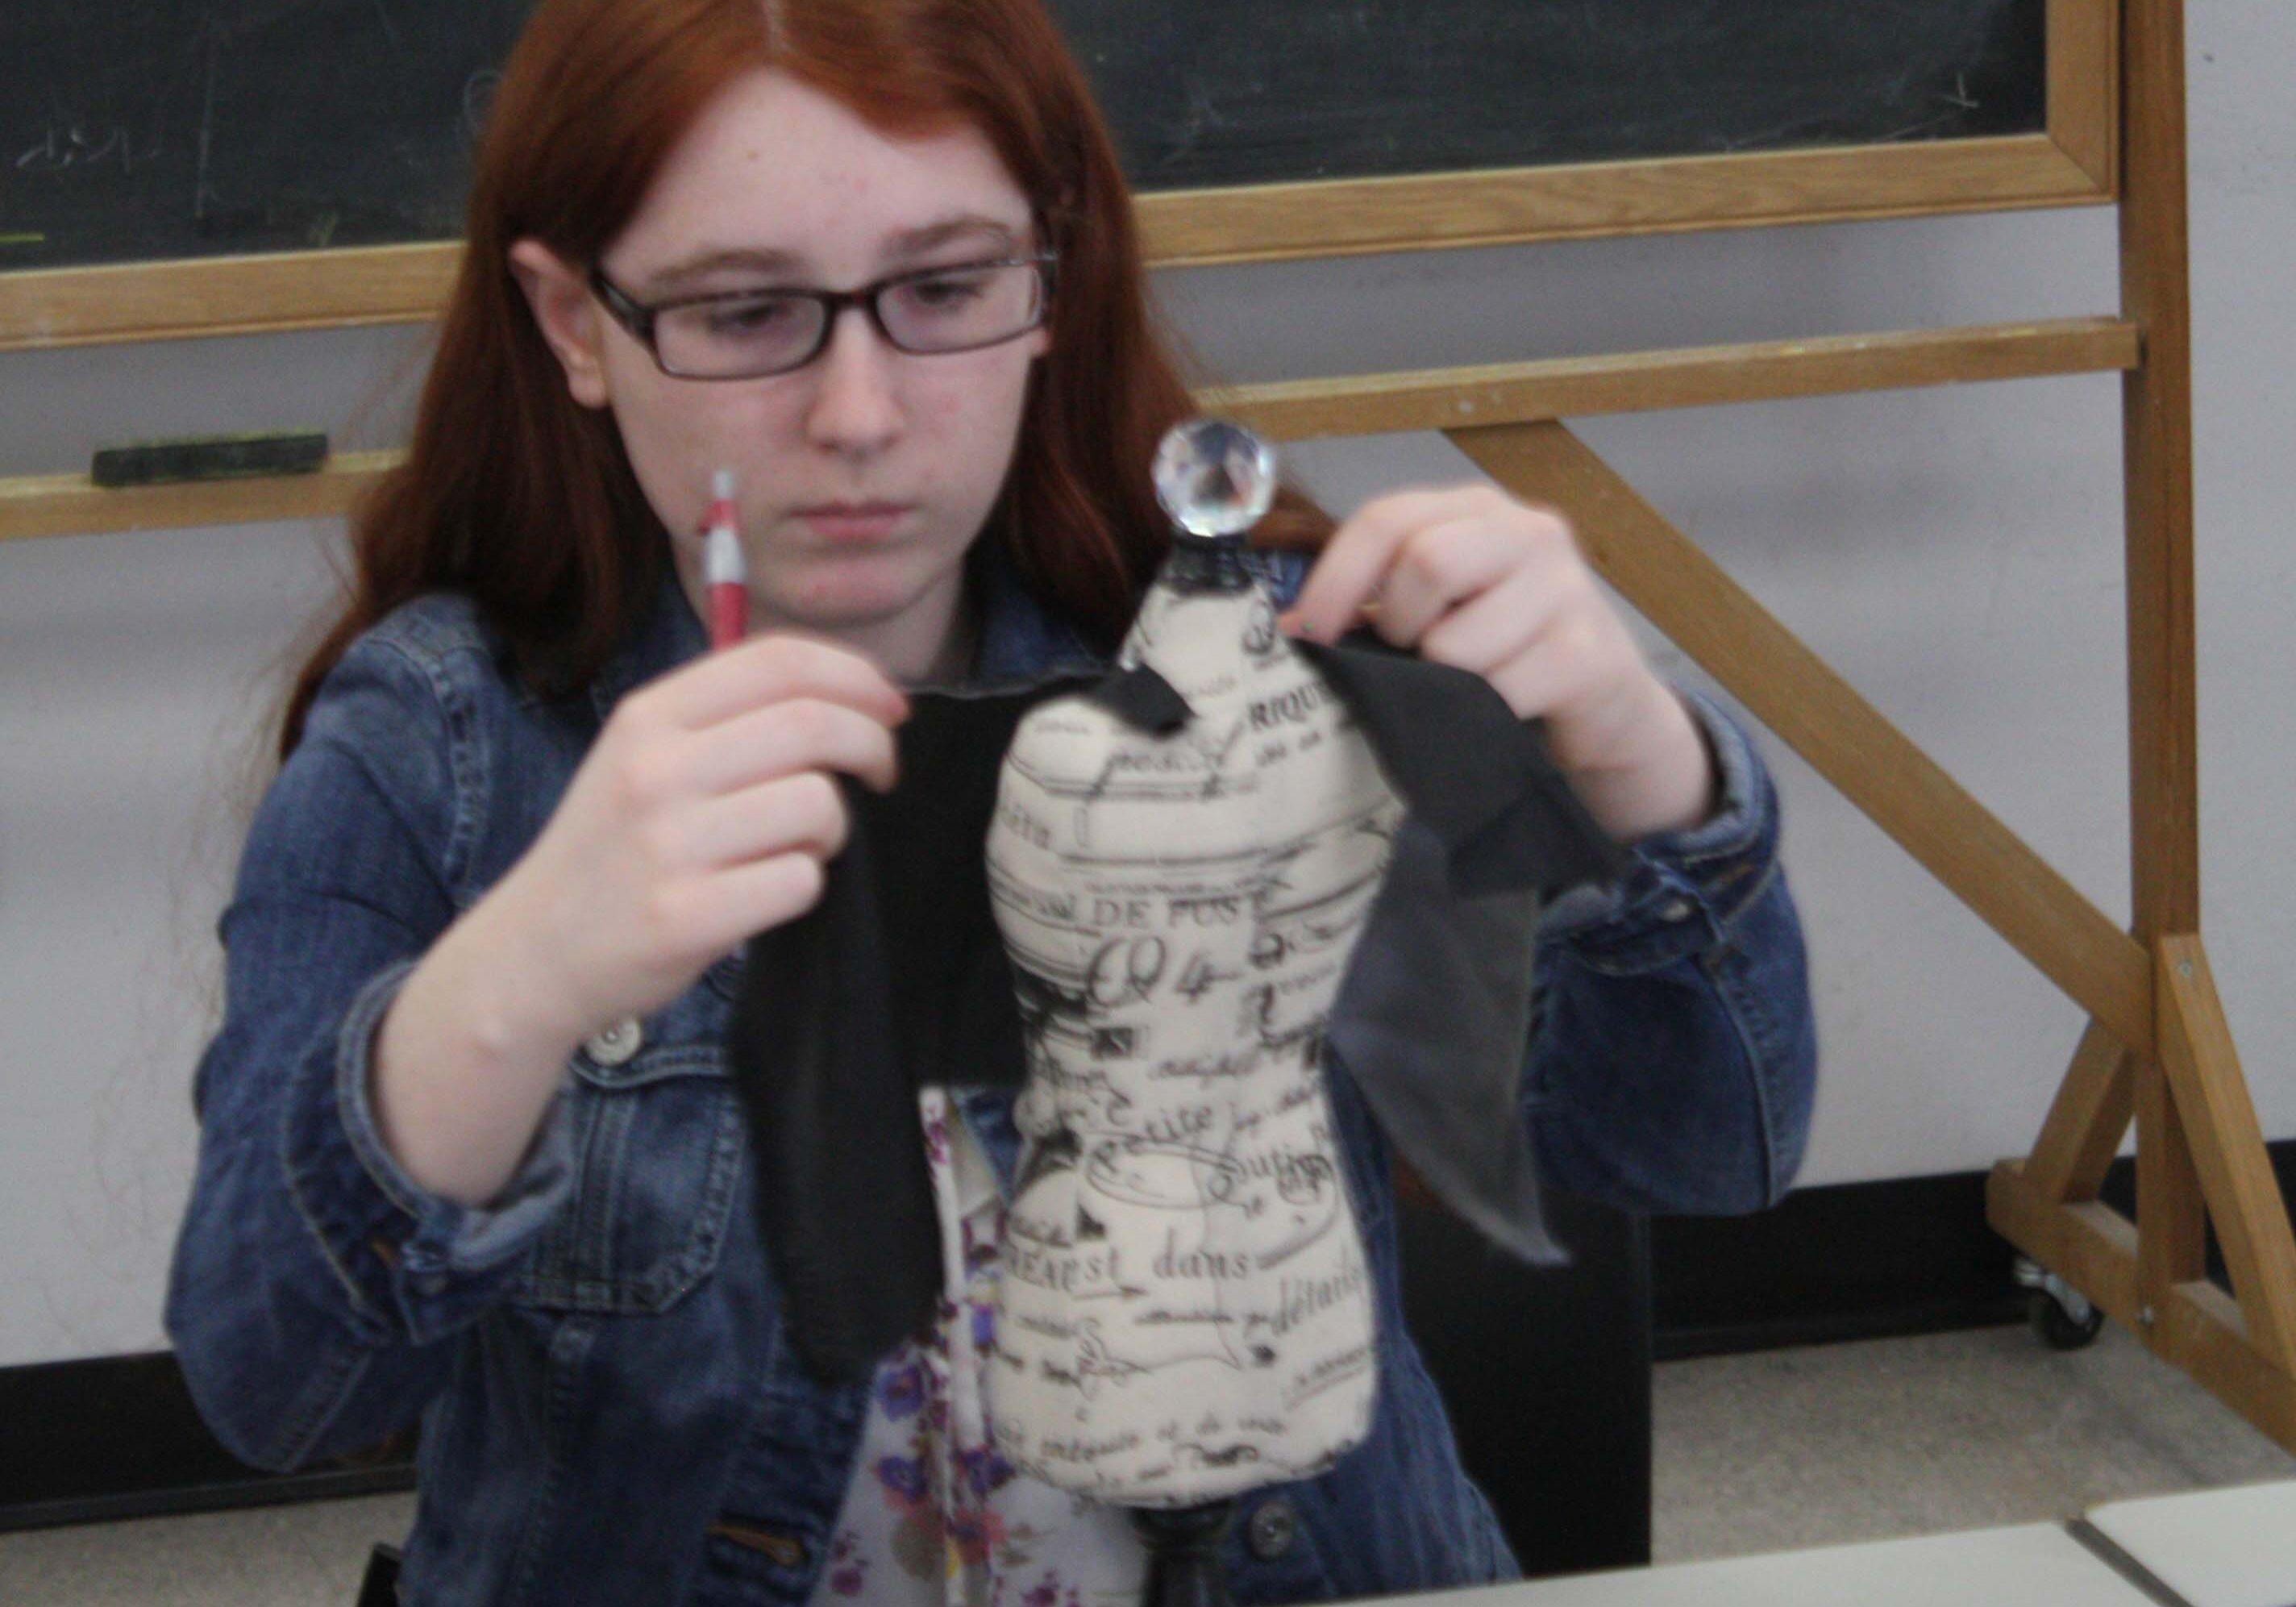 A participant in a teen program designs a dress on a miniature dress form